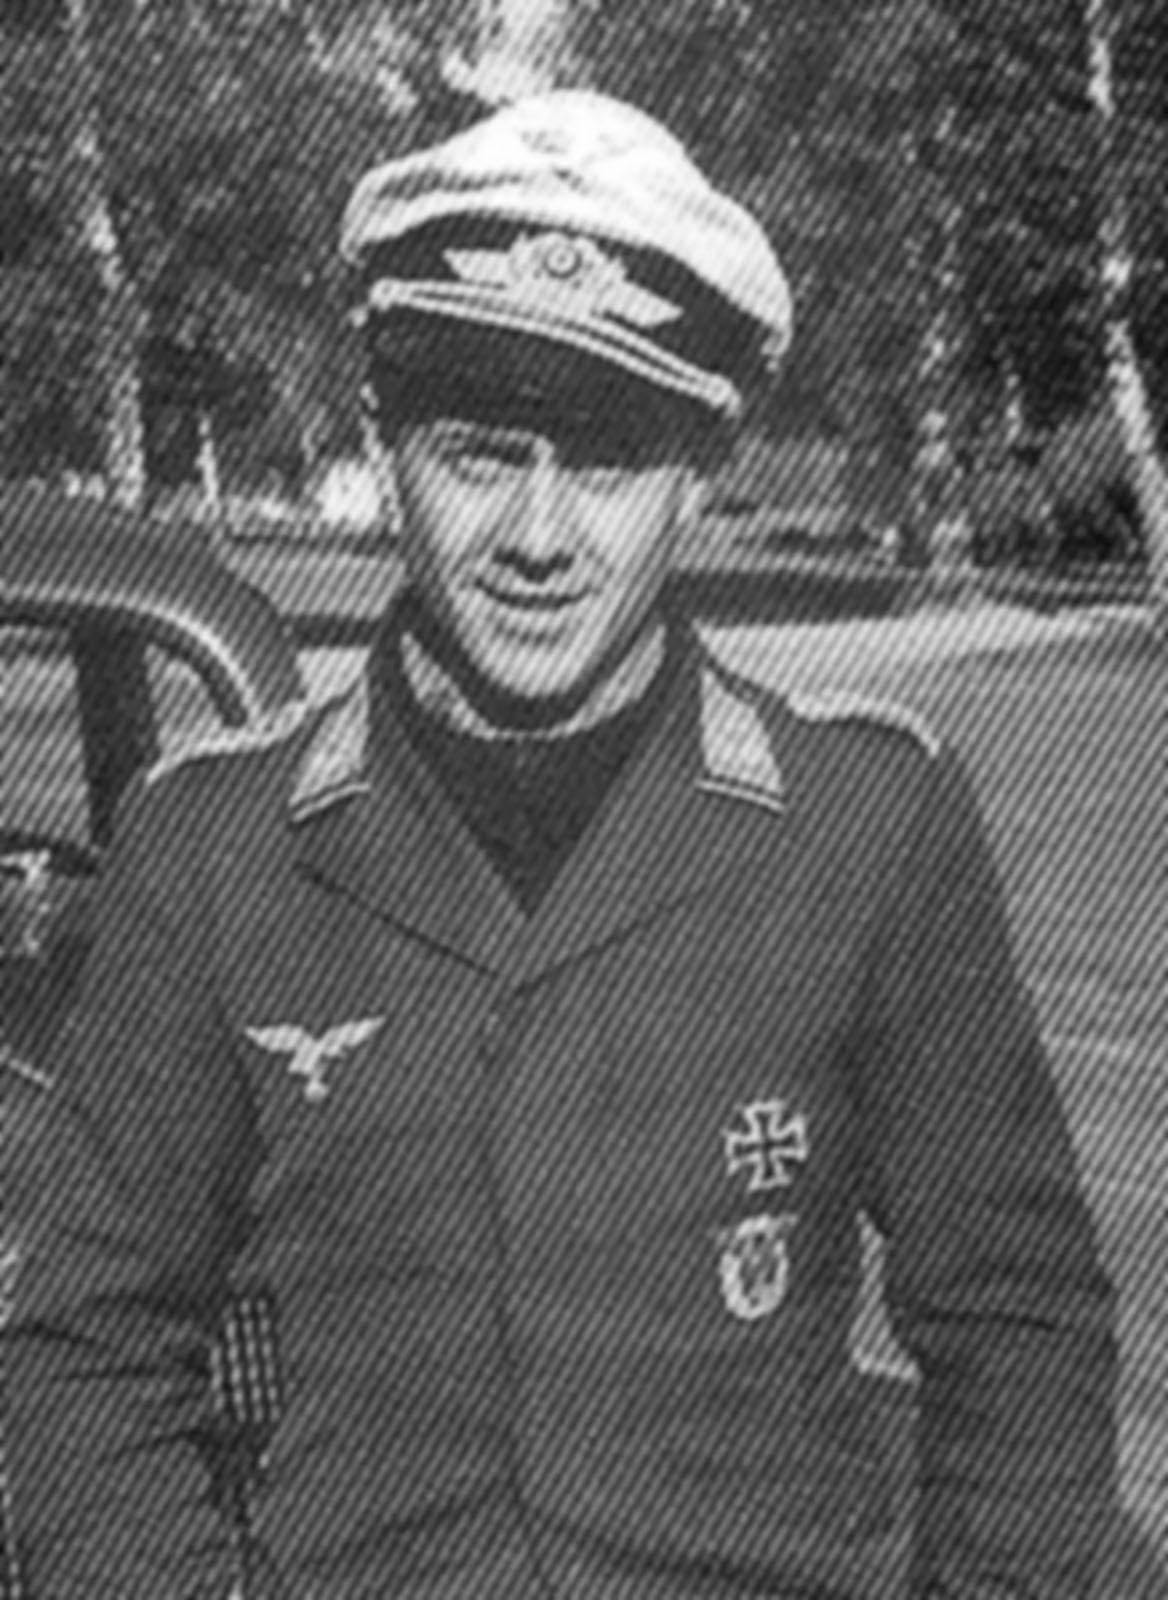 Aircrew Luftwaffe pilot 1.ZG76 Hans Kettling Norway 1940 01